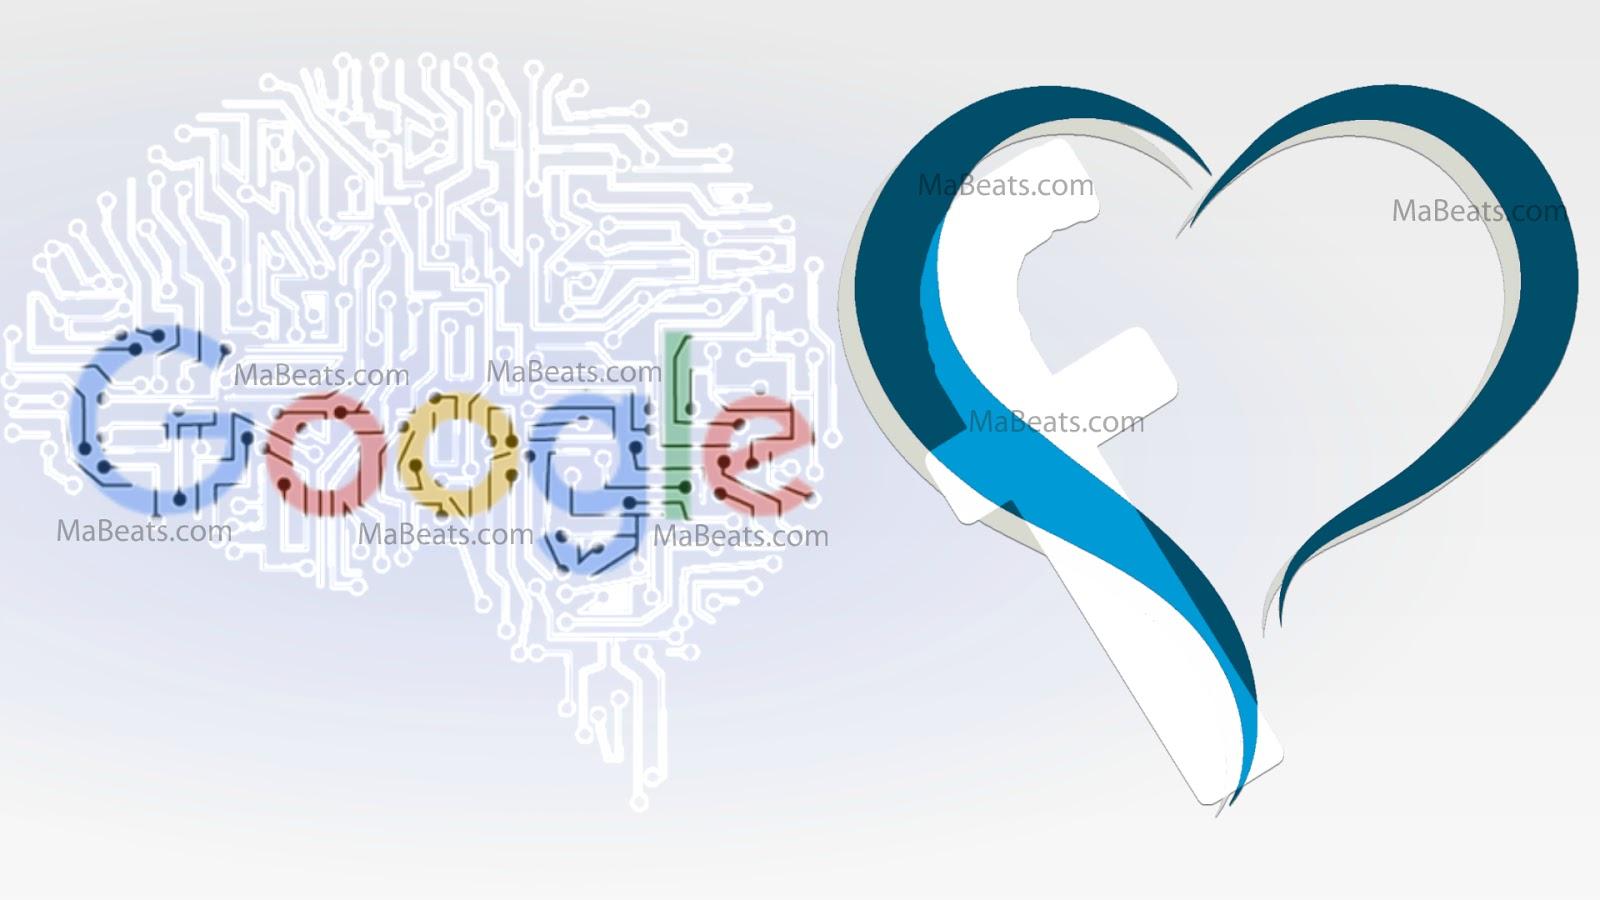 Google, Facebook, heart, brain, blue heart, white background, cyber brain, Internet